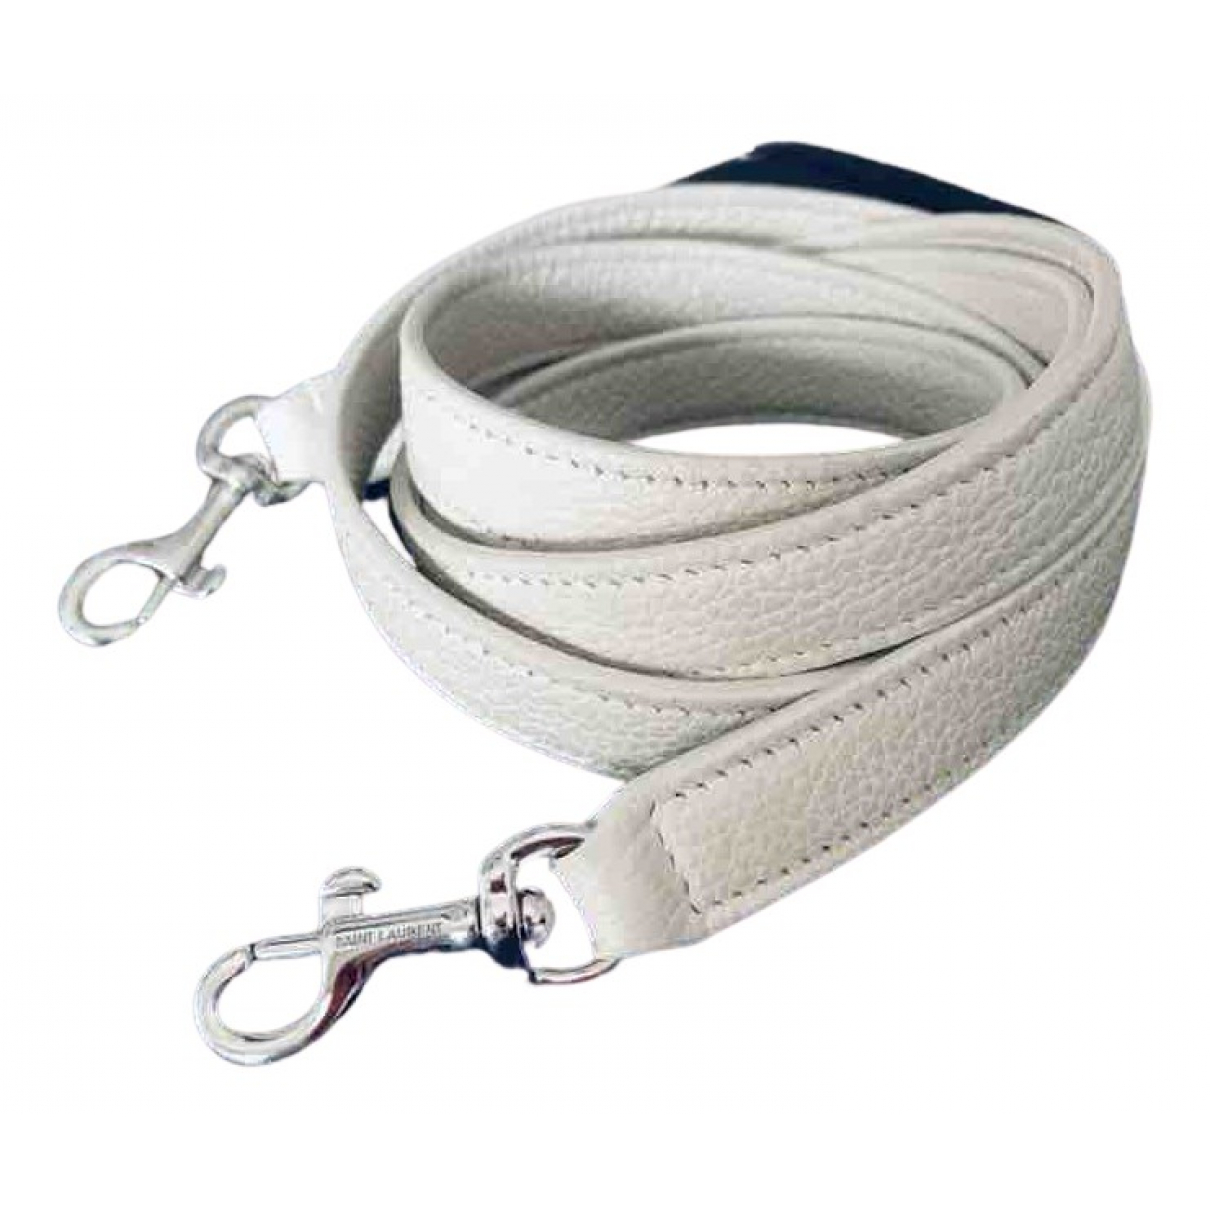 Saint Laurent N White Leather Purses, wallet & cases for Women N